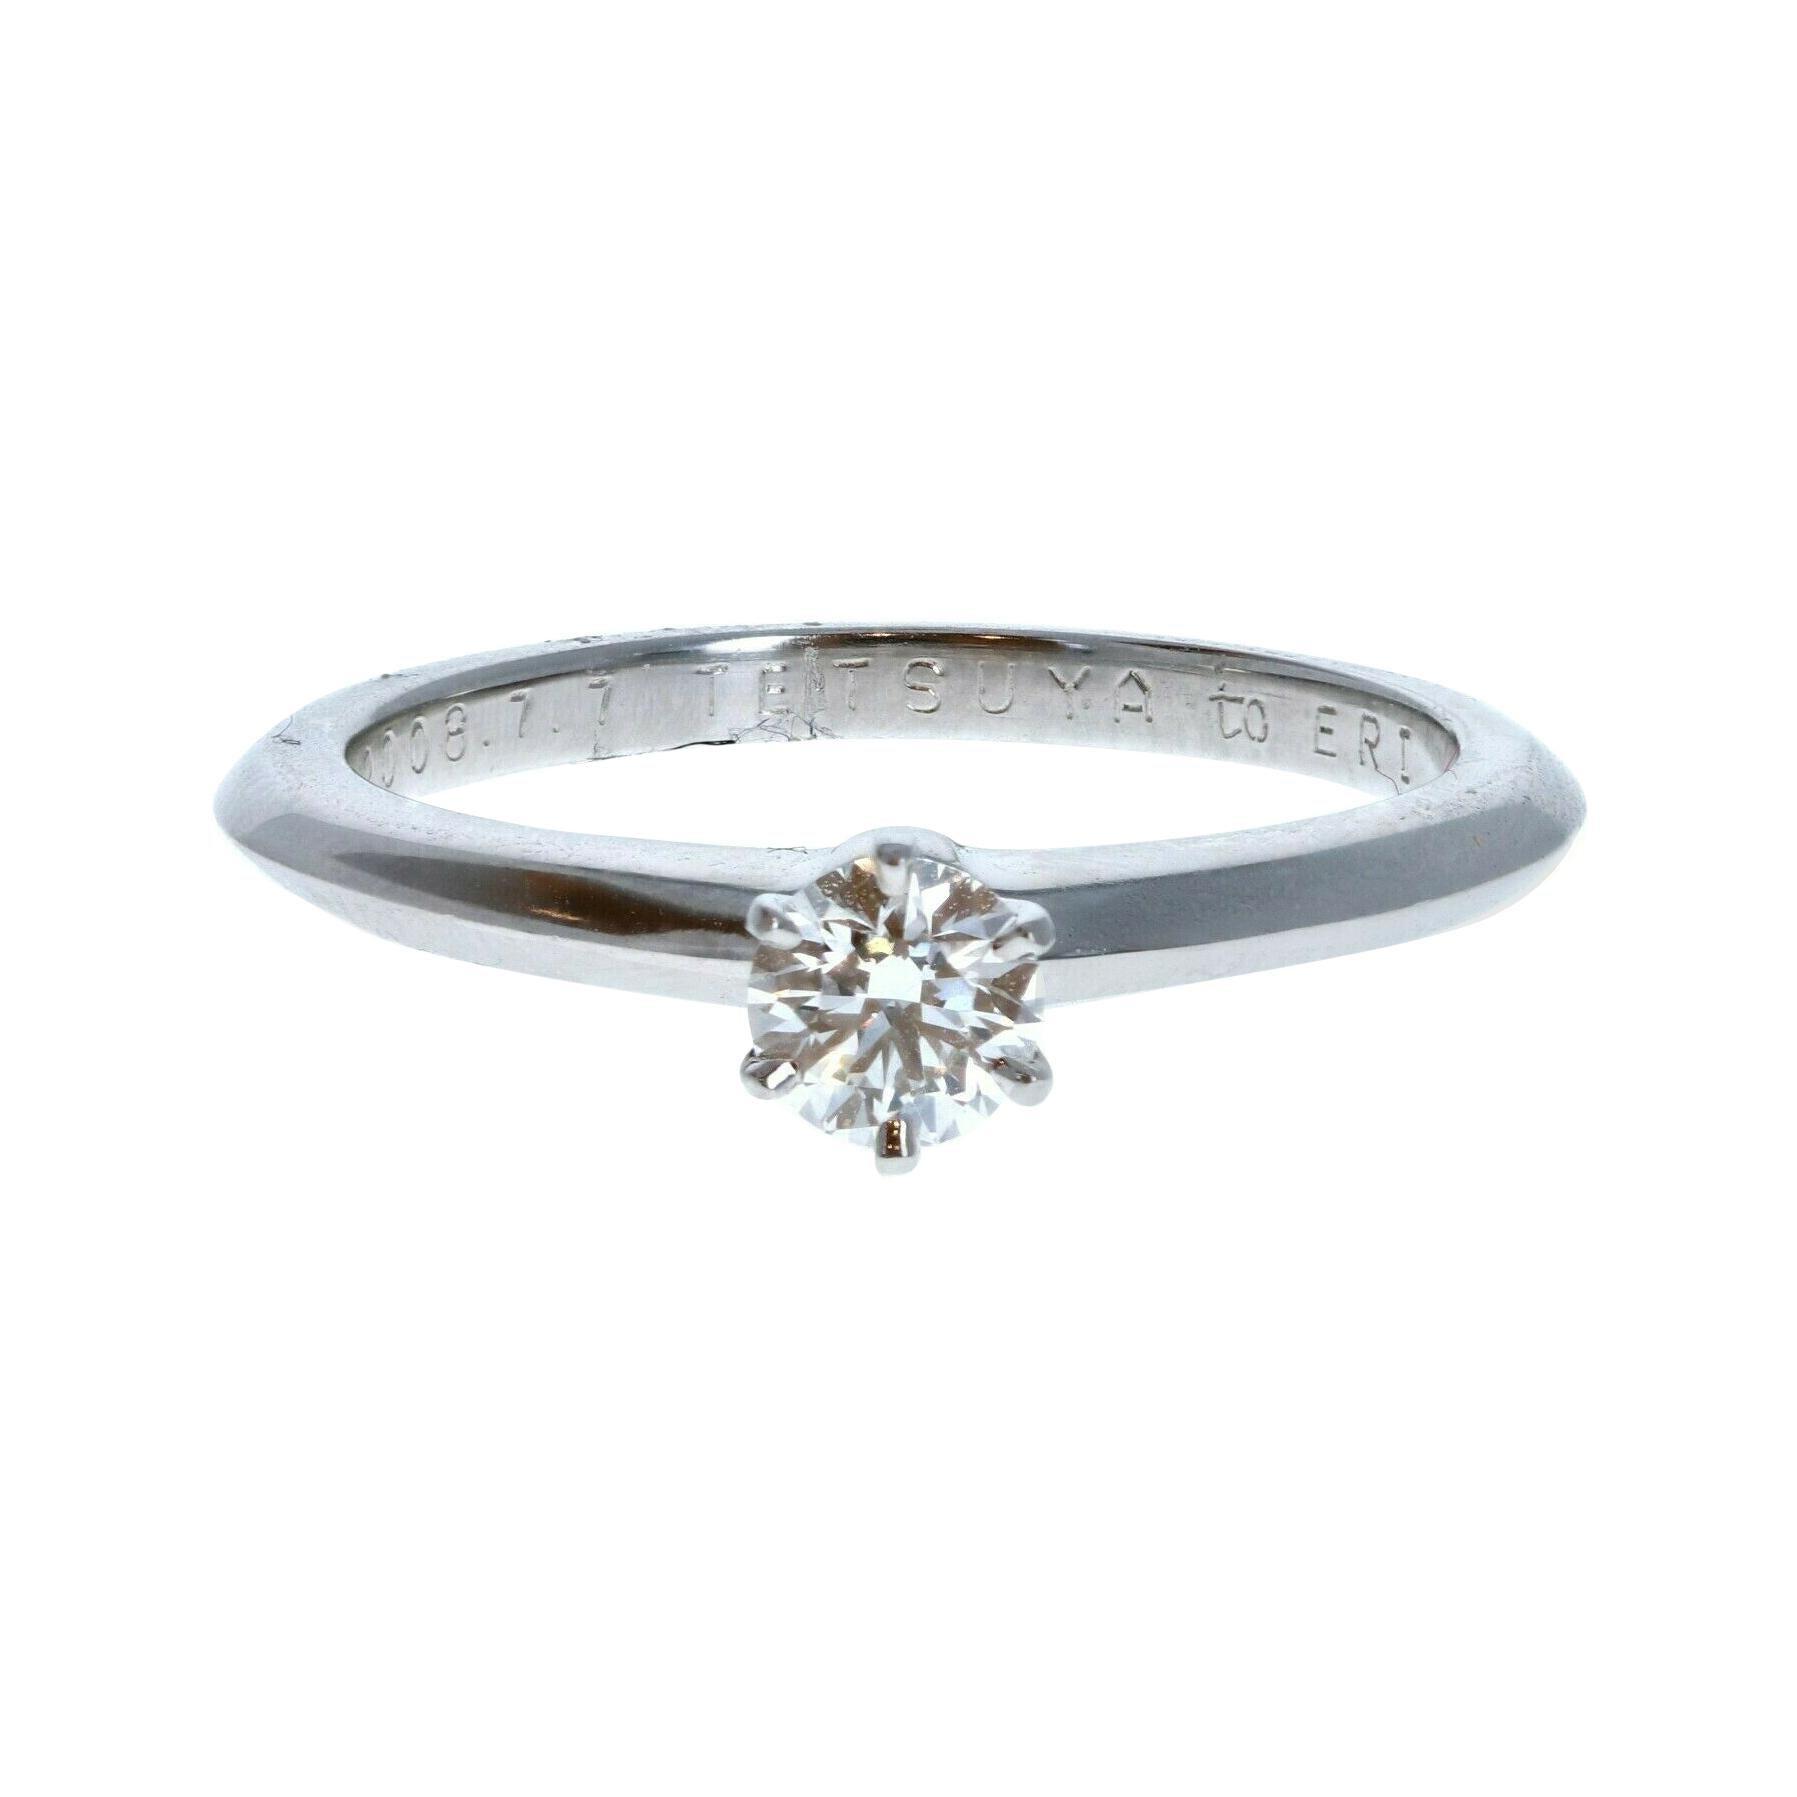 Tiffany & Co Platinum & Diamond Solitaire Ring 0.29ctw